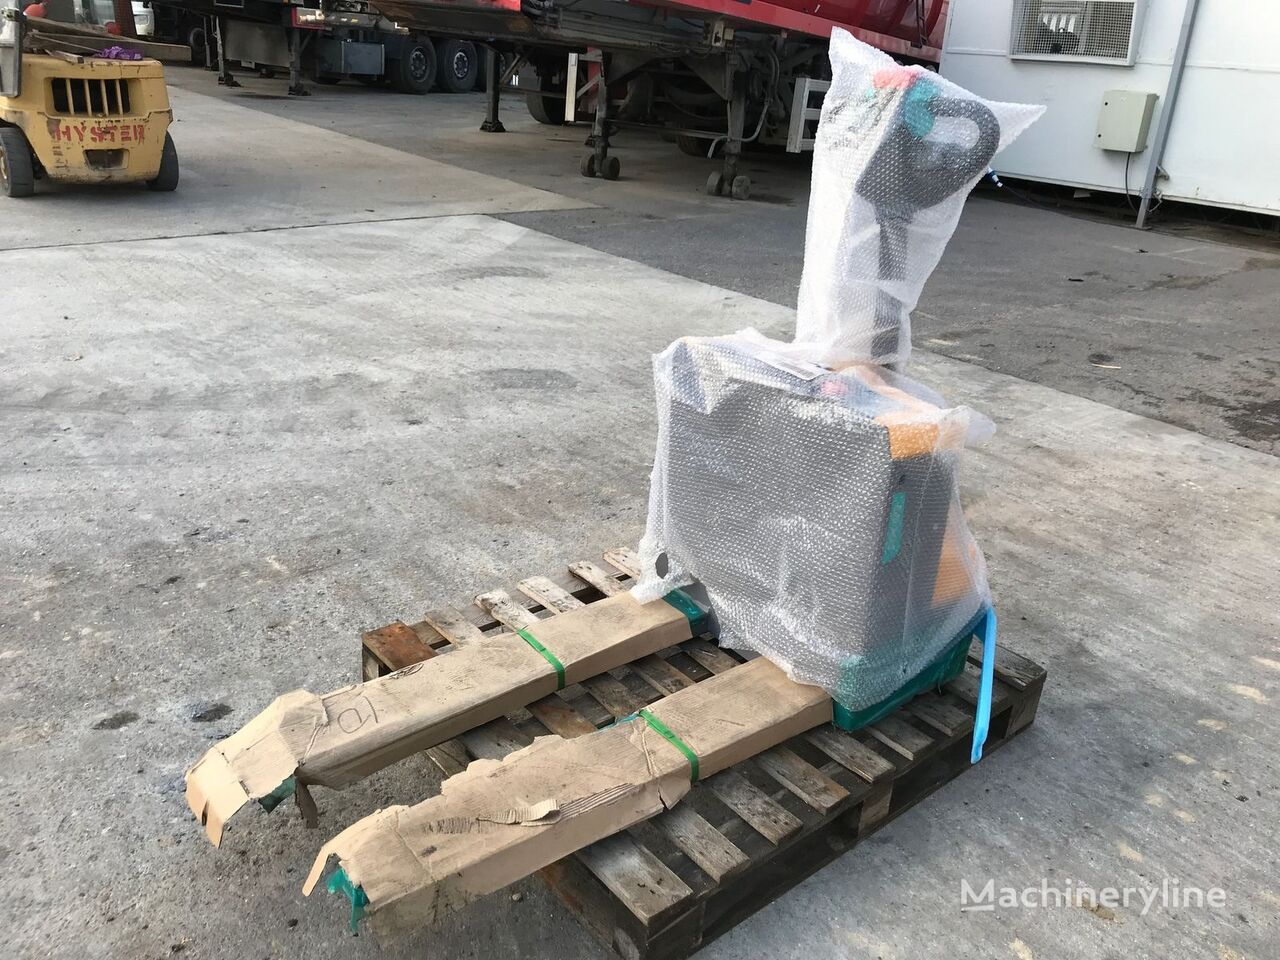 new JUNGHEINRICH EJE M15 electric pallet truck